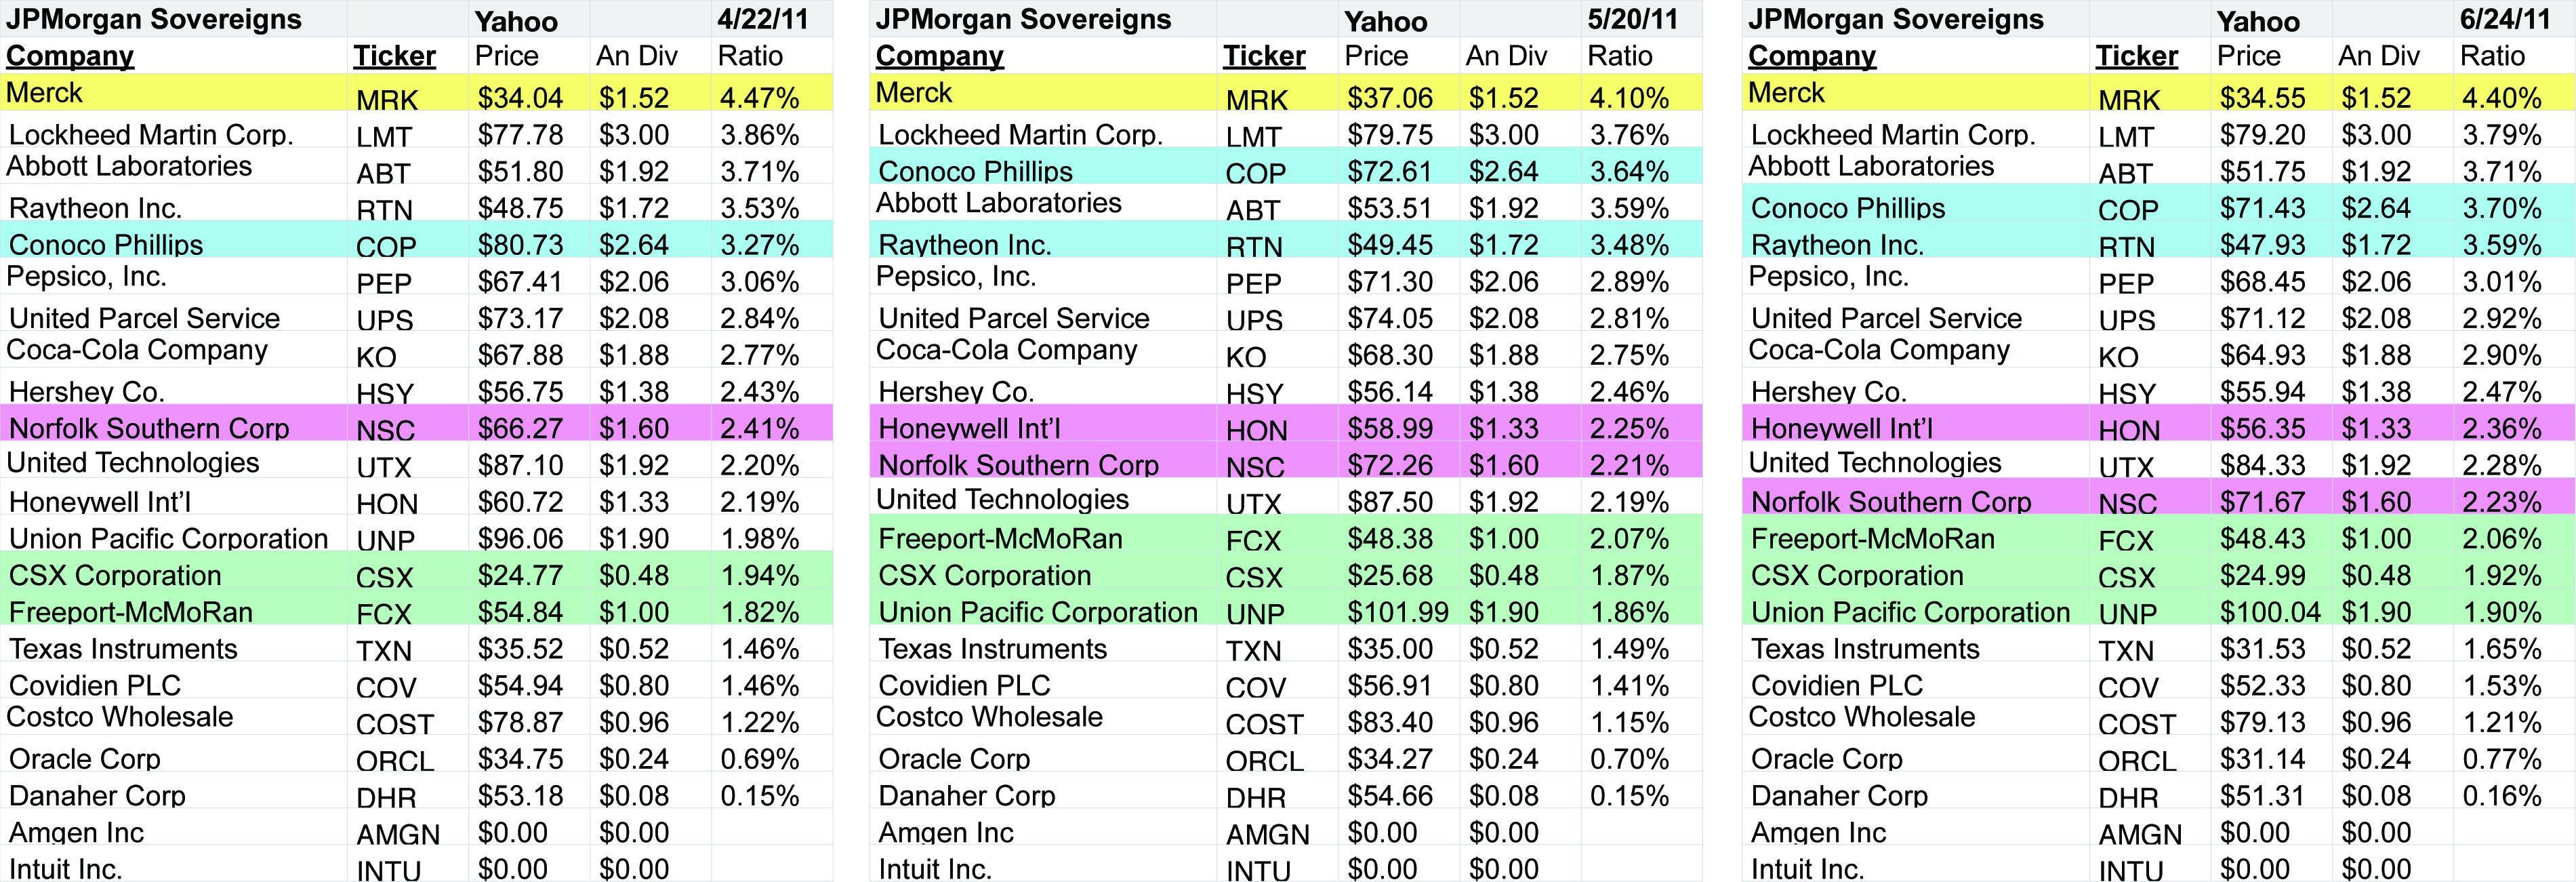 October\'s \'Dogs Of The JPMorgan Sovereigns\' | Seeking Alpha